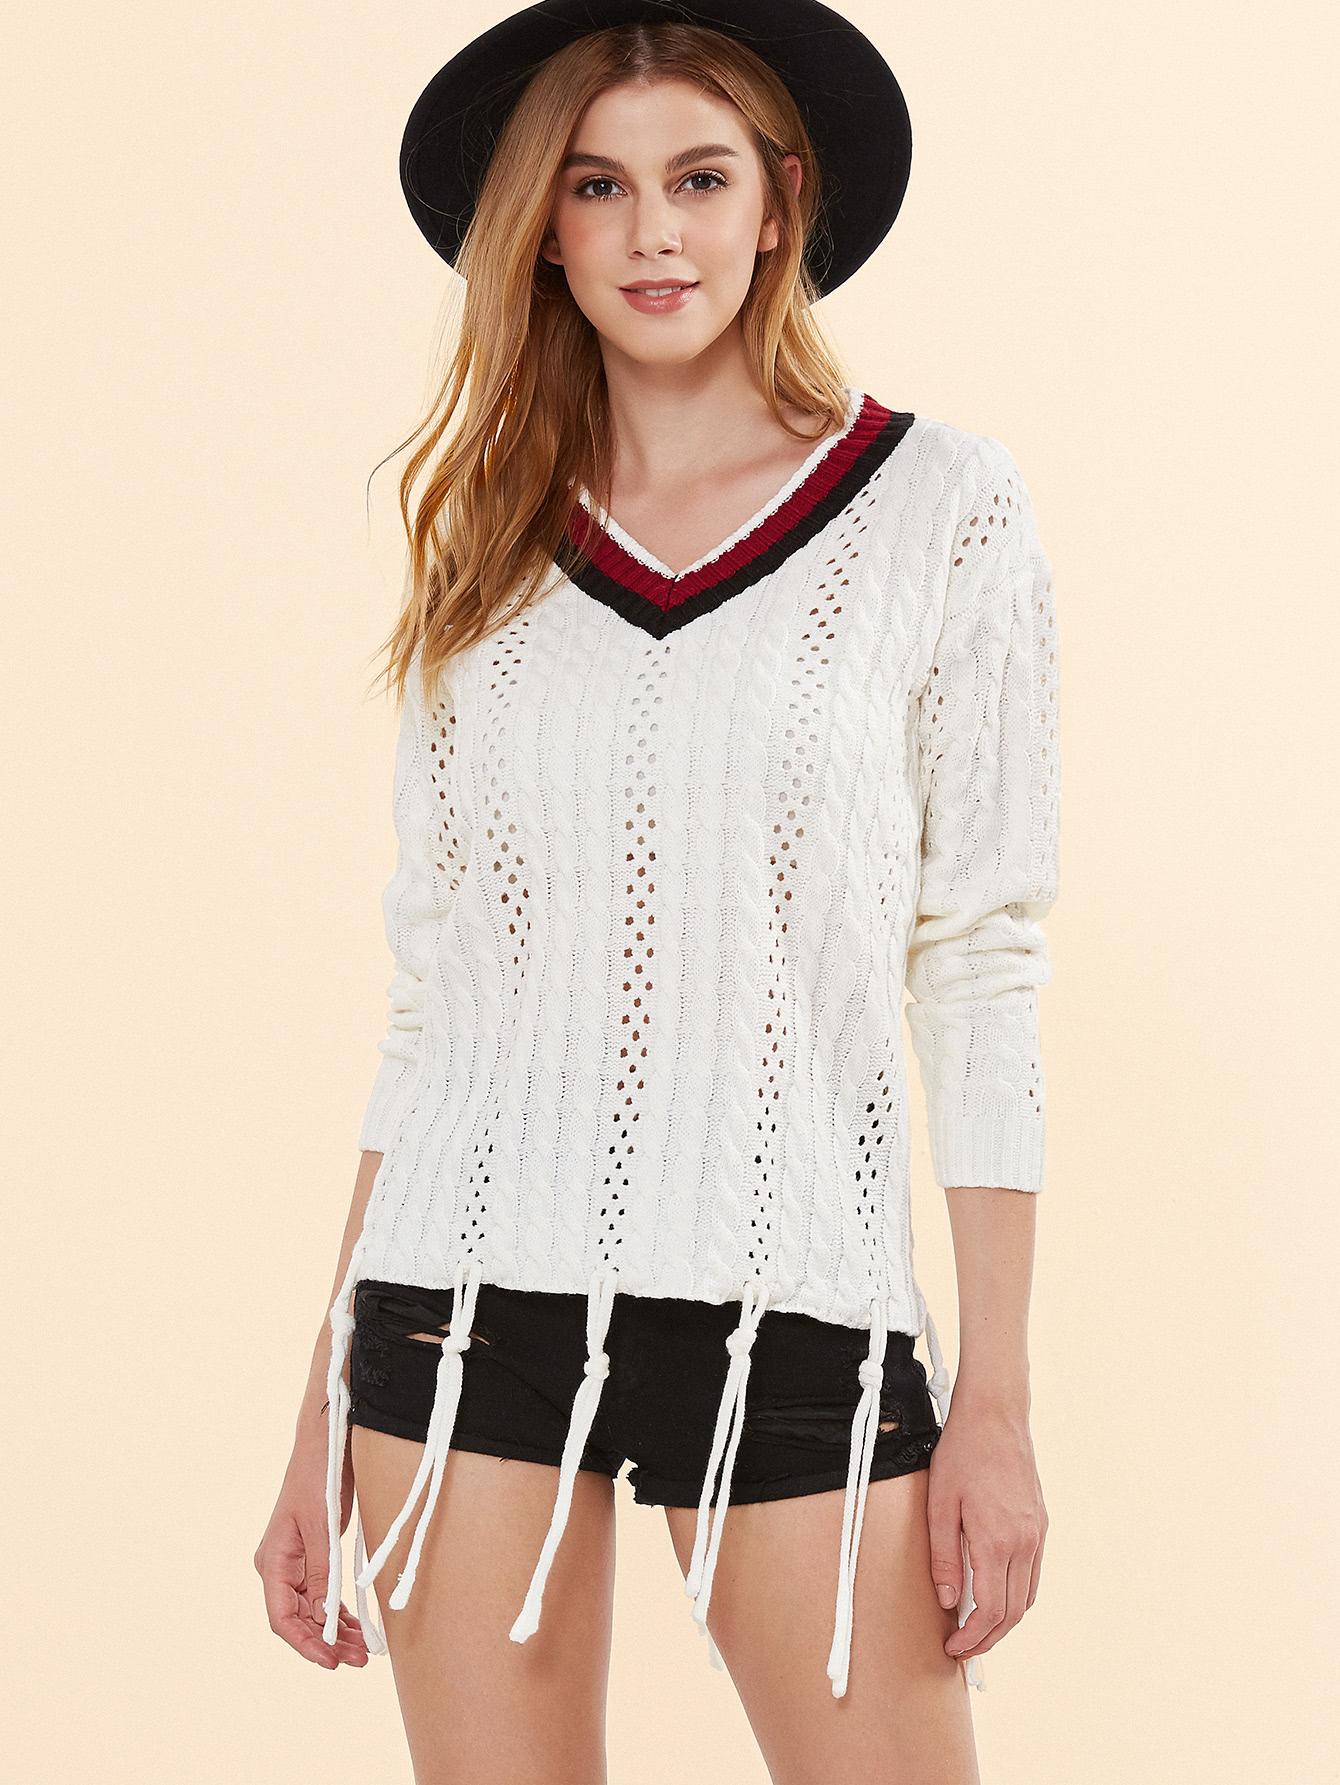 sweater160926455_3